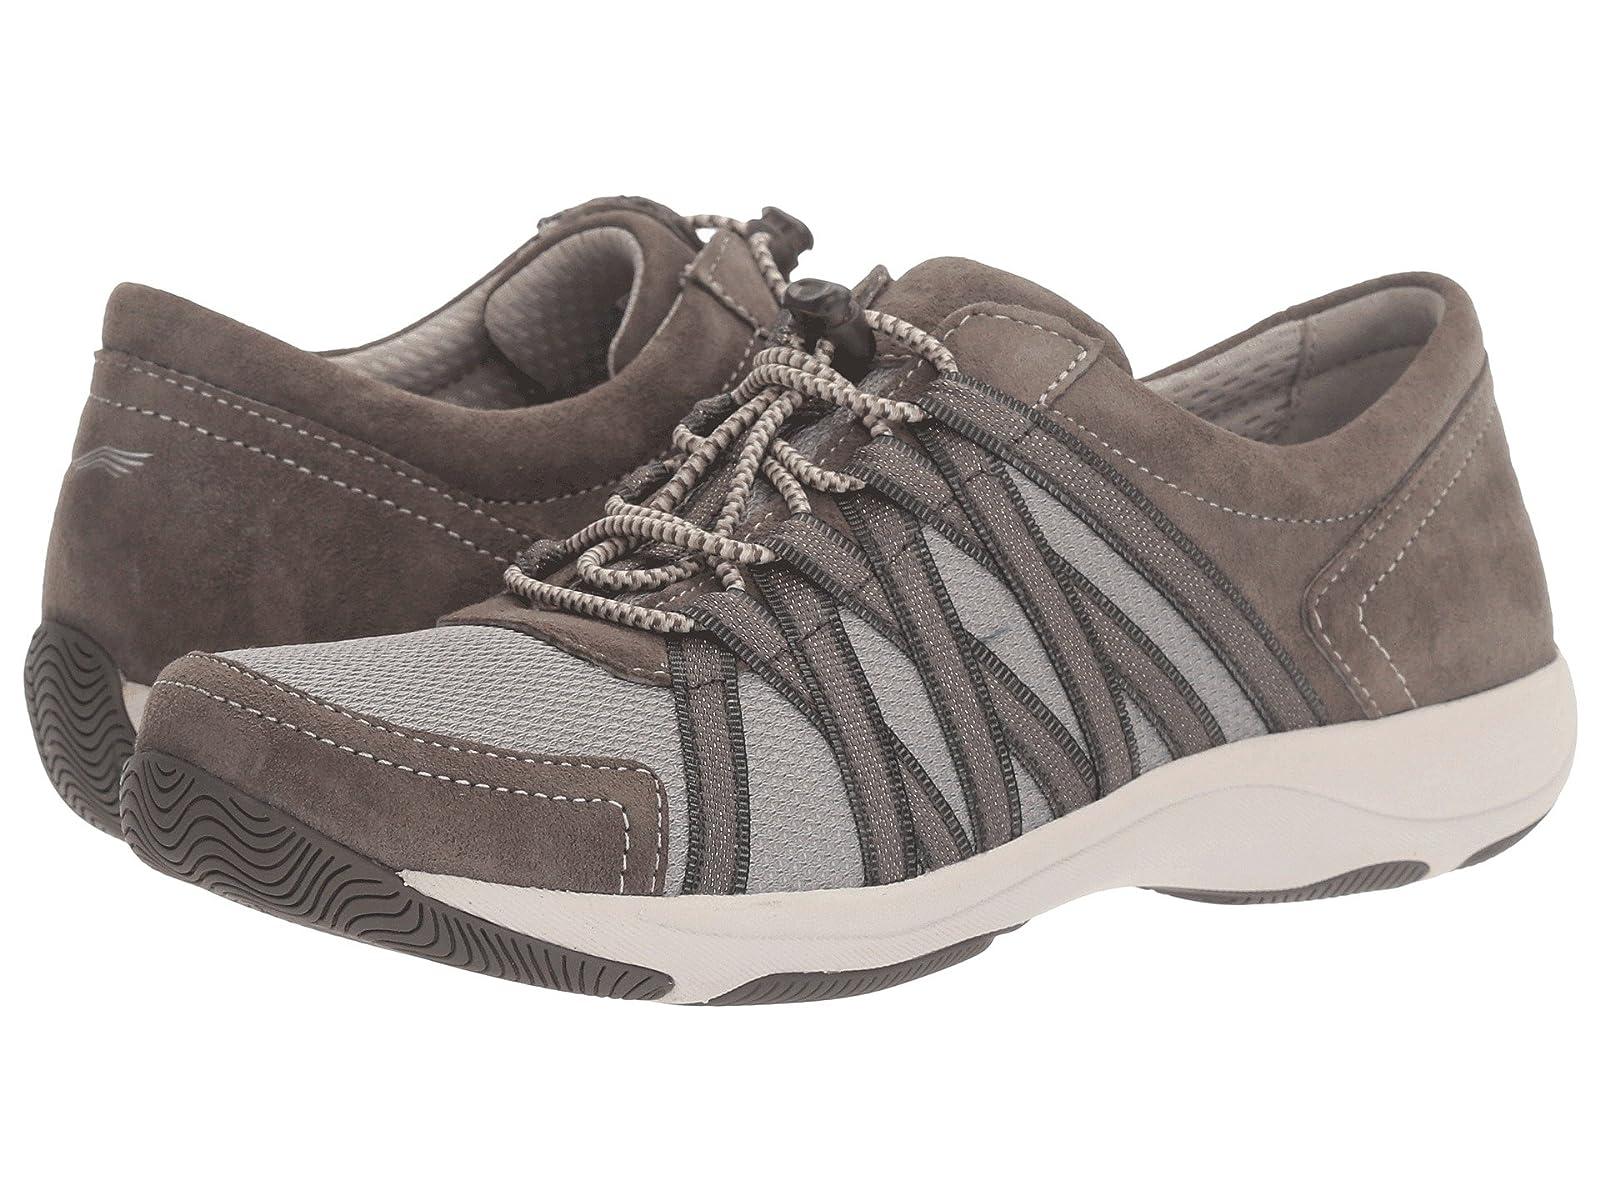 Dansko HonorAtmospheric grades have affordable shoes